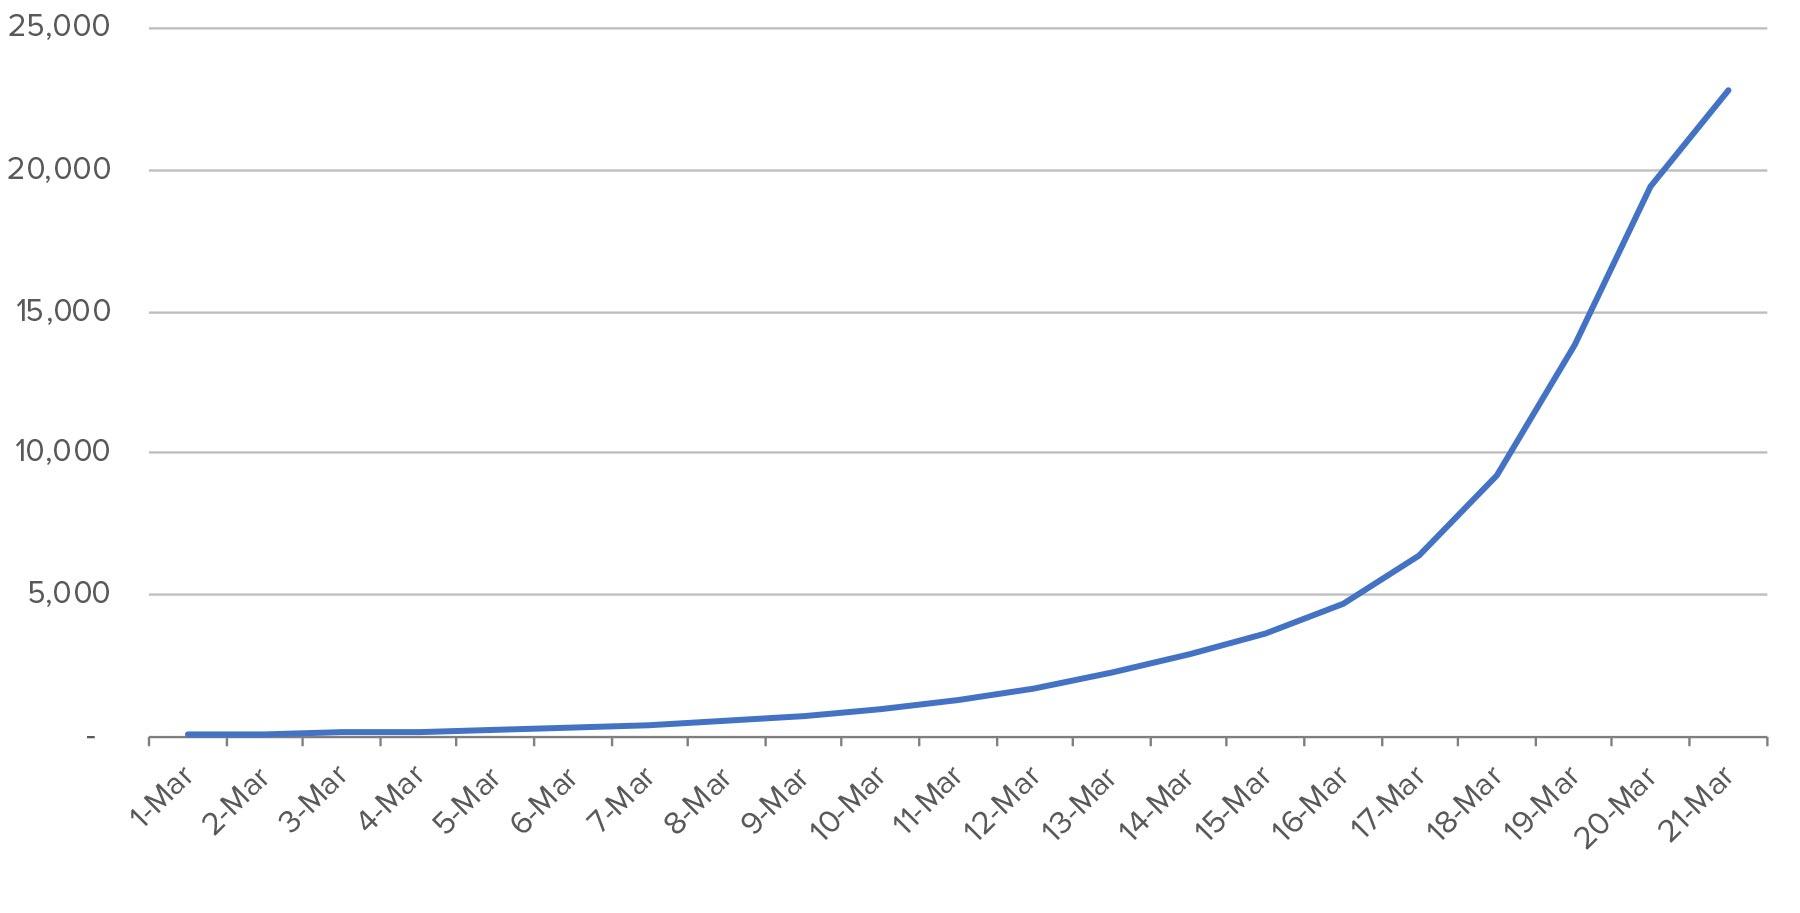 Coronaviris-Number-of-Cases